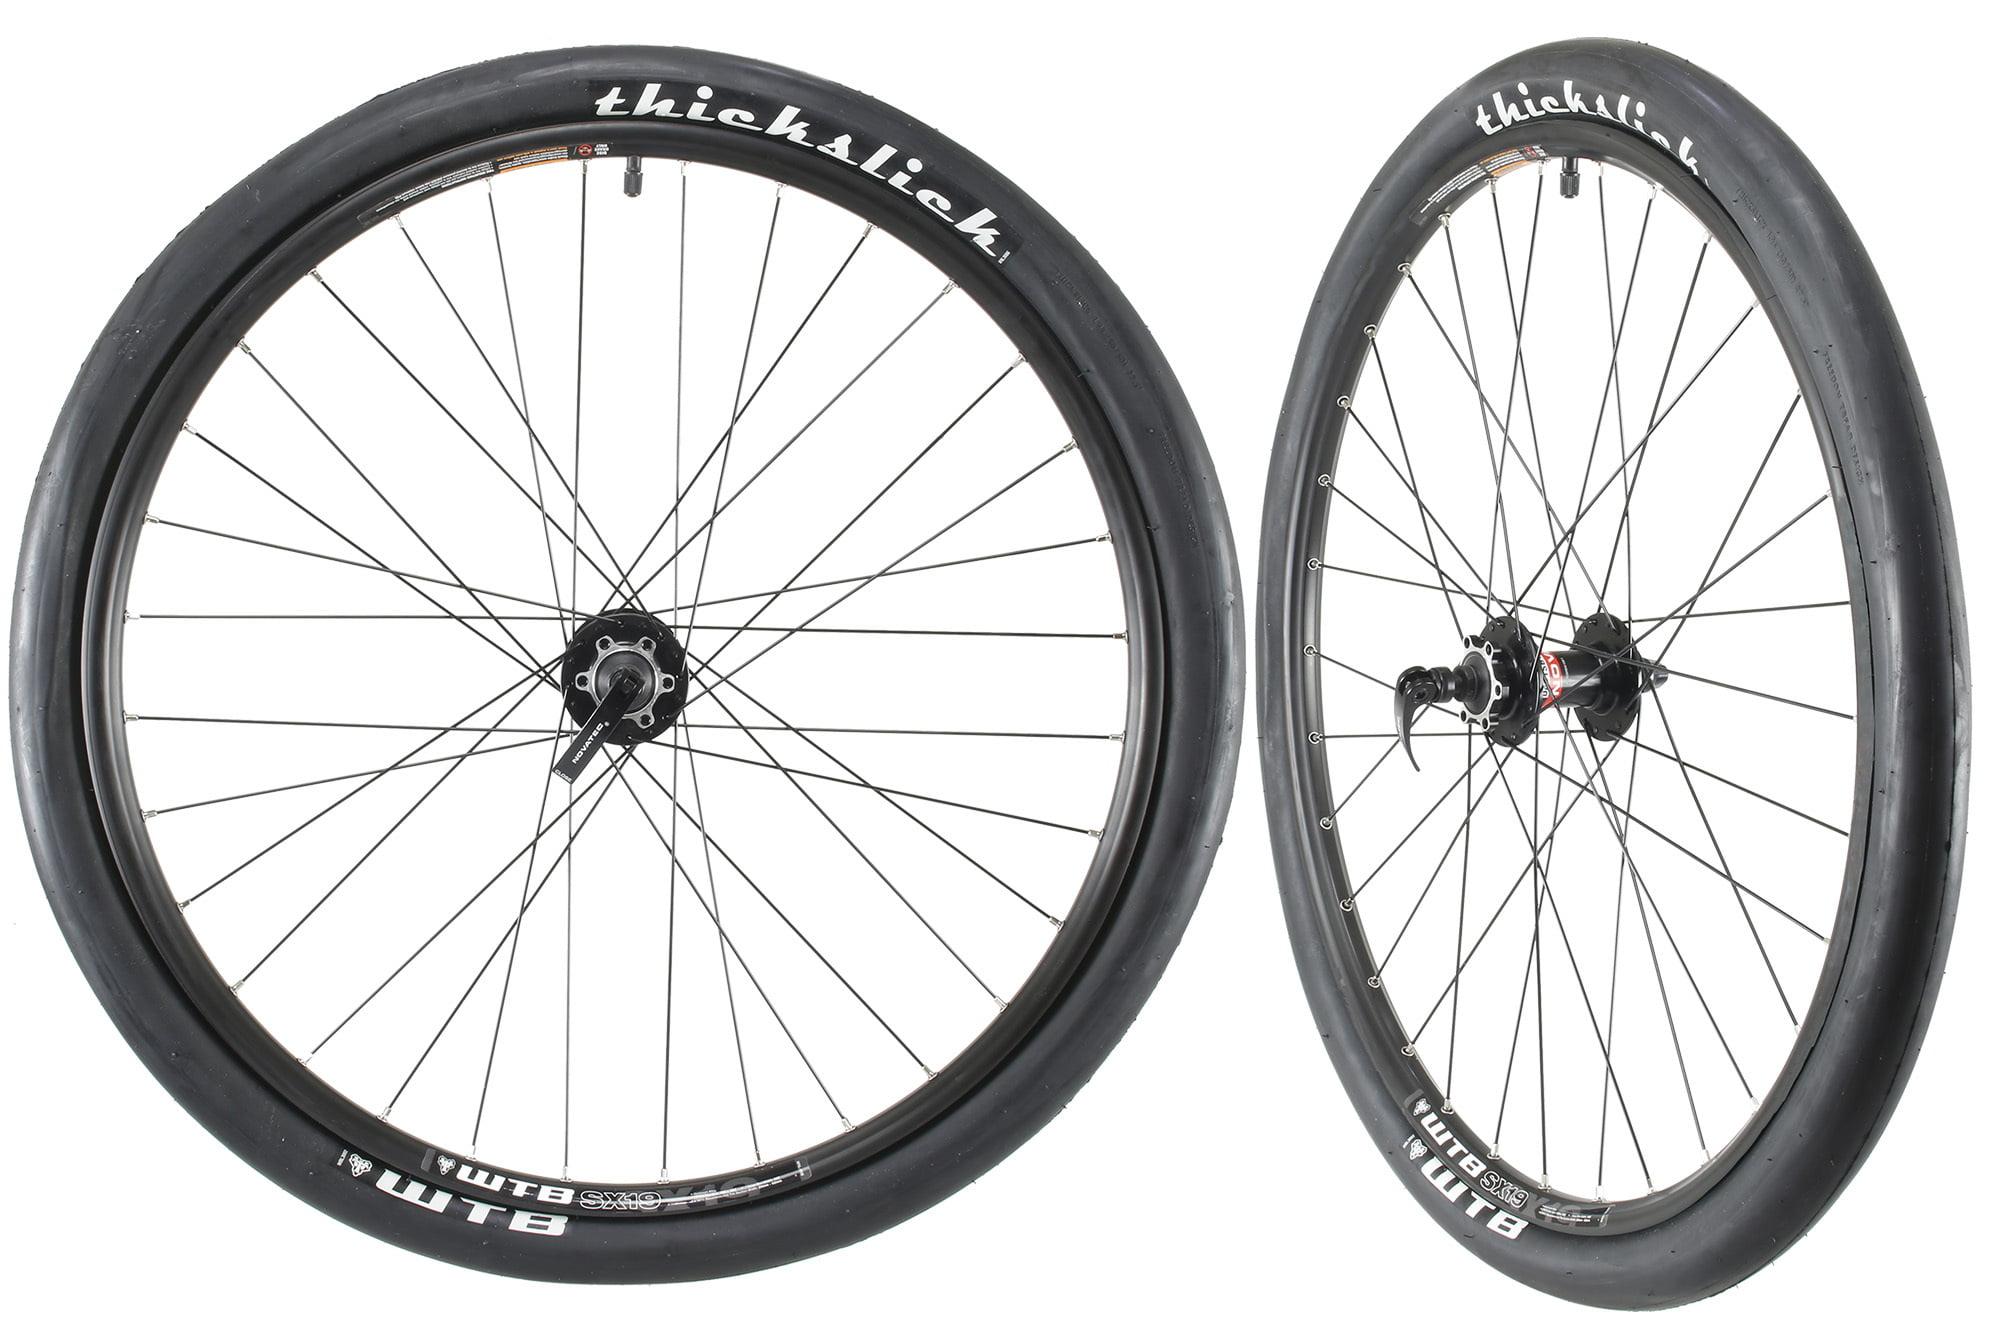 "WTB SX19 Mountain Bike Bicycle Novatec Hubs /& Tyres Wheelset 11s 27.5/"" QR"